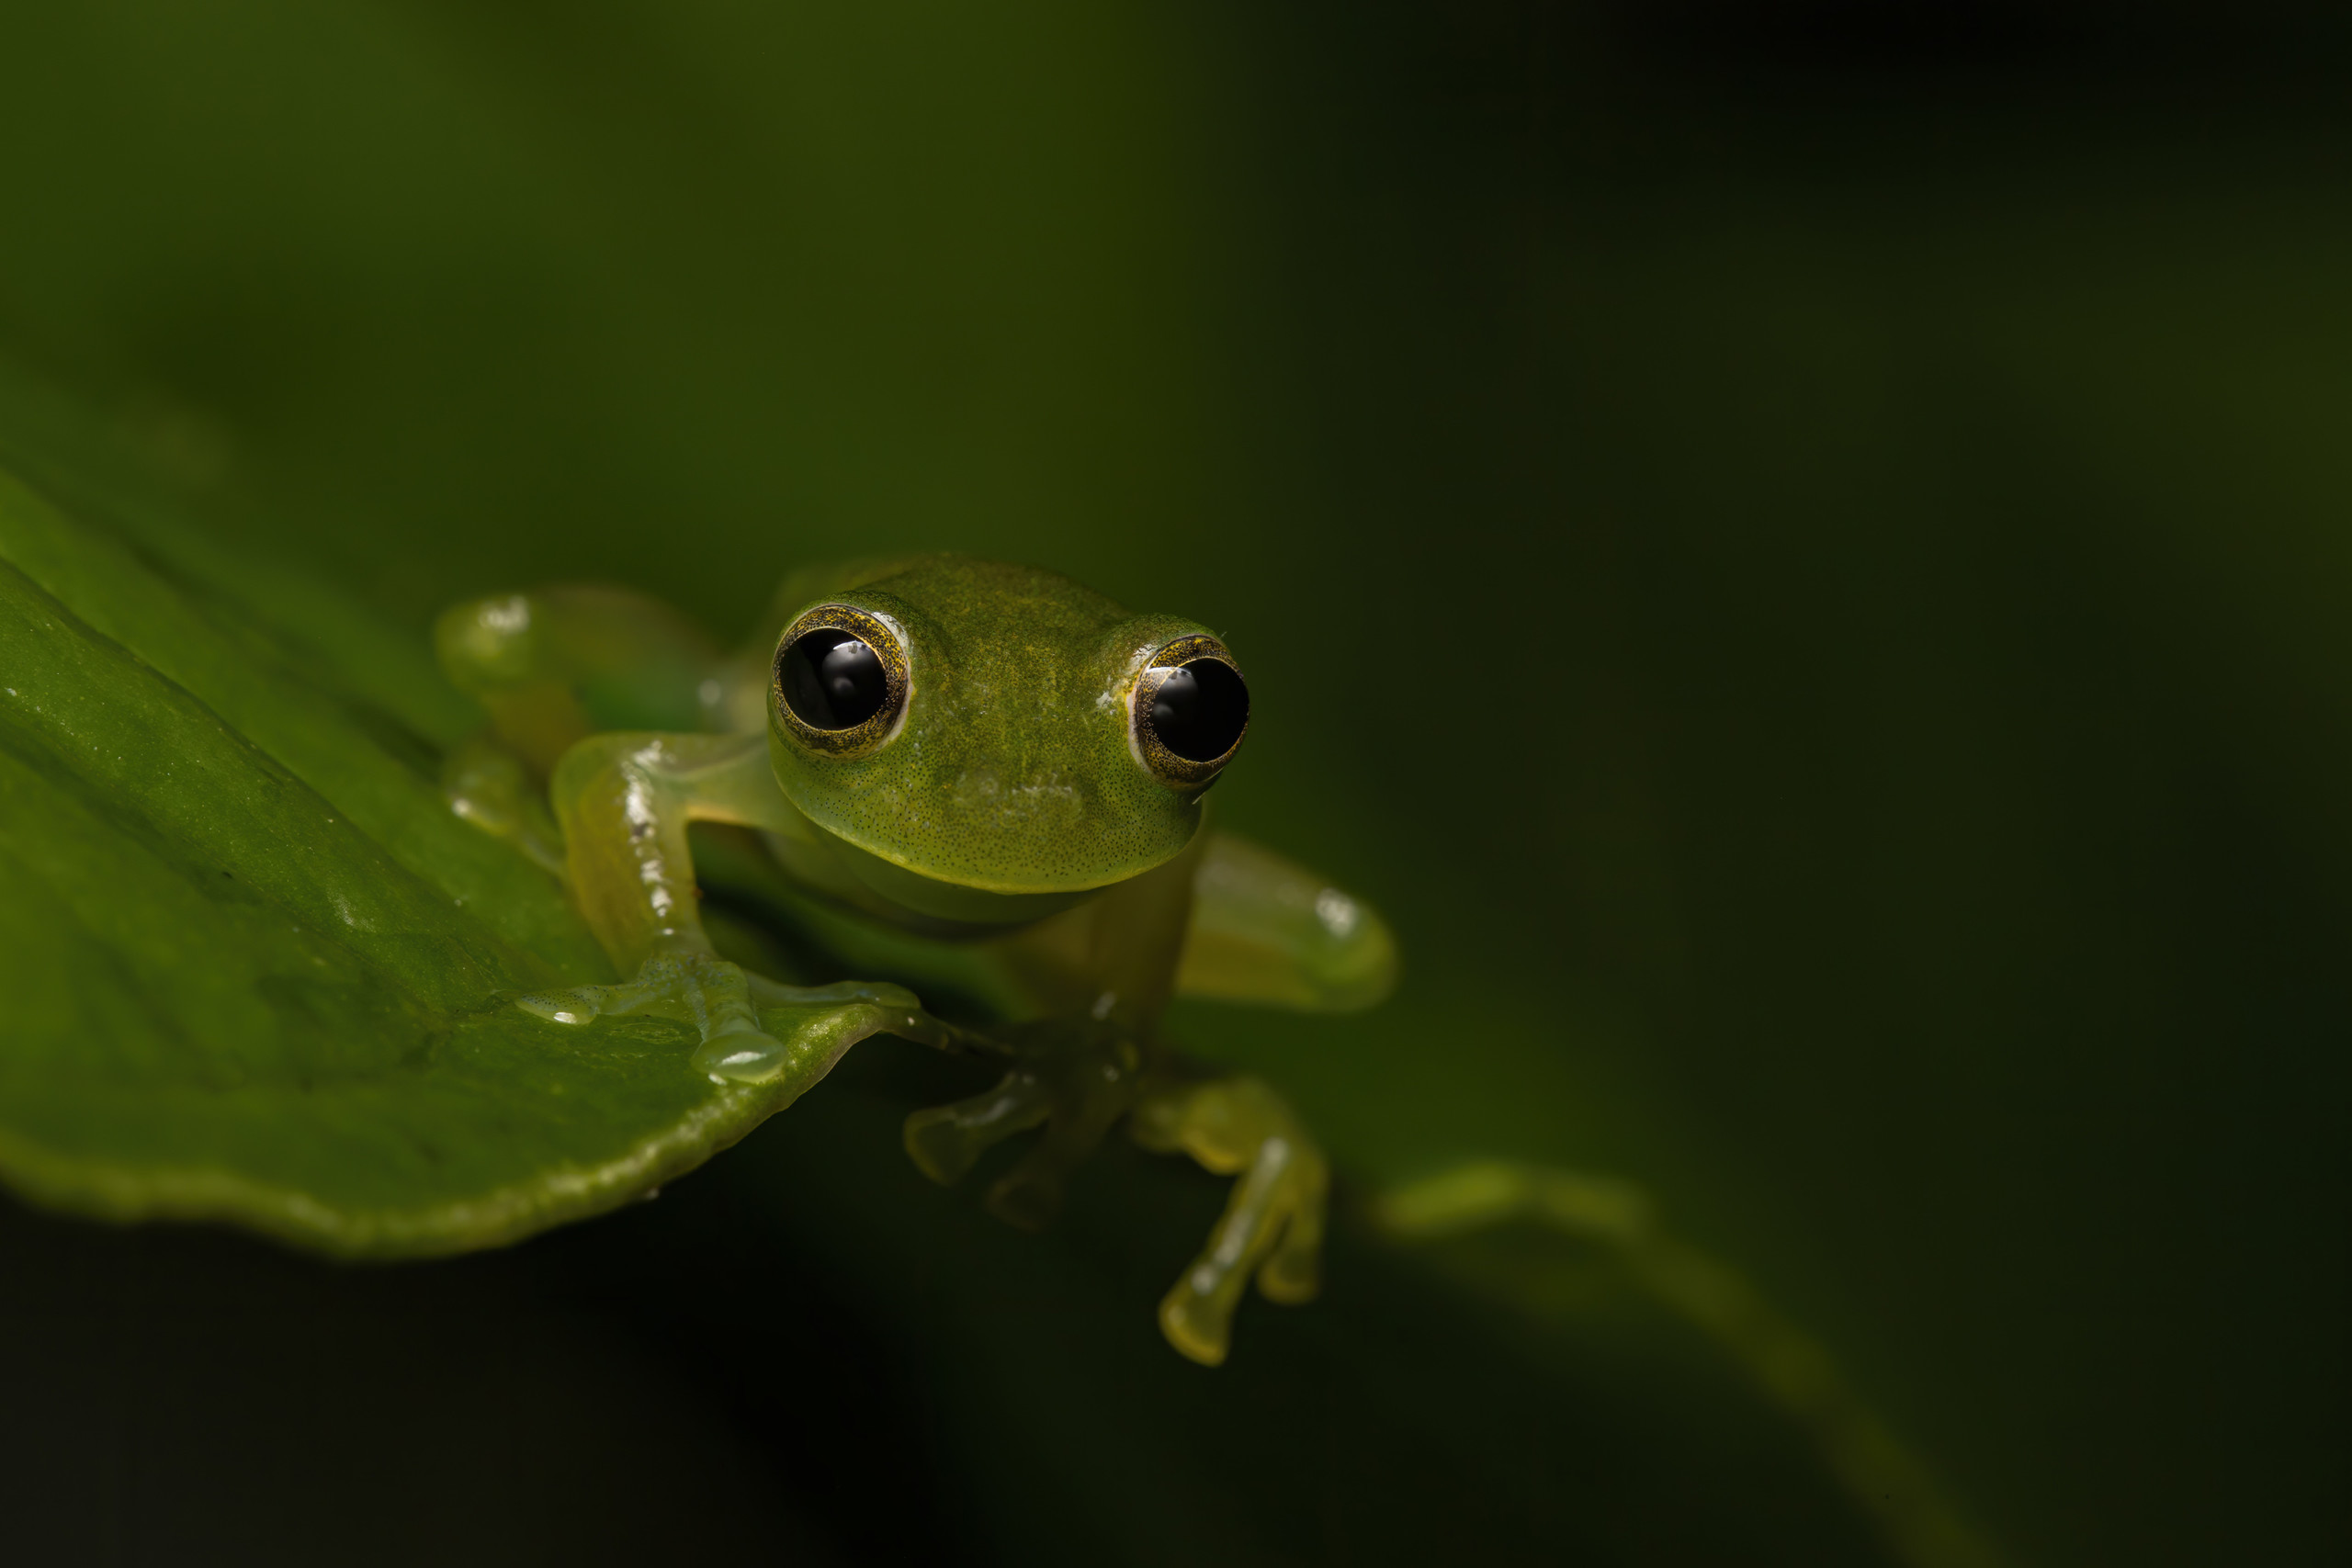 Crystal frog Esparadana prosoblepon - Cynthia Bandurek